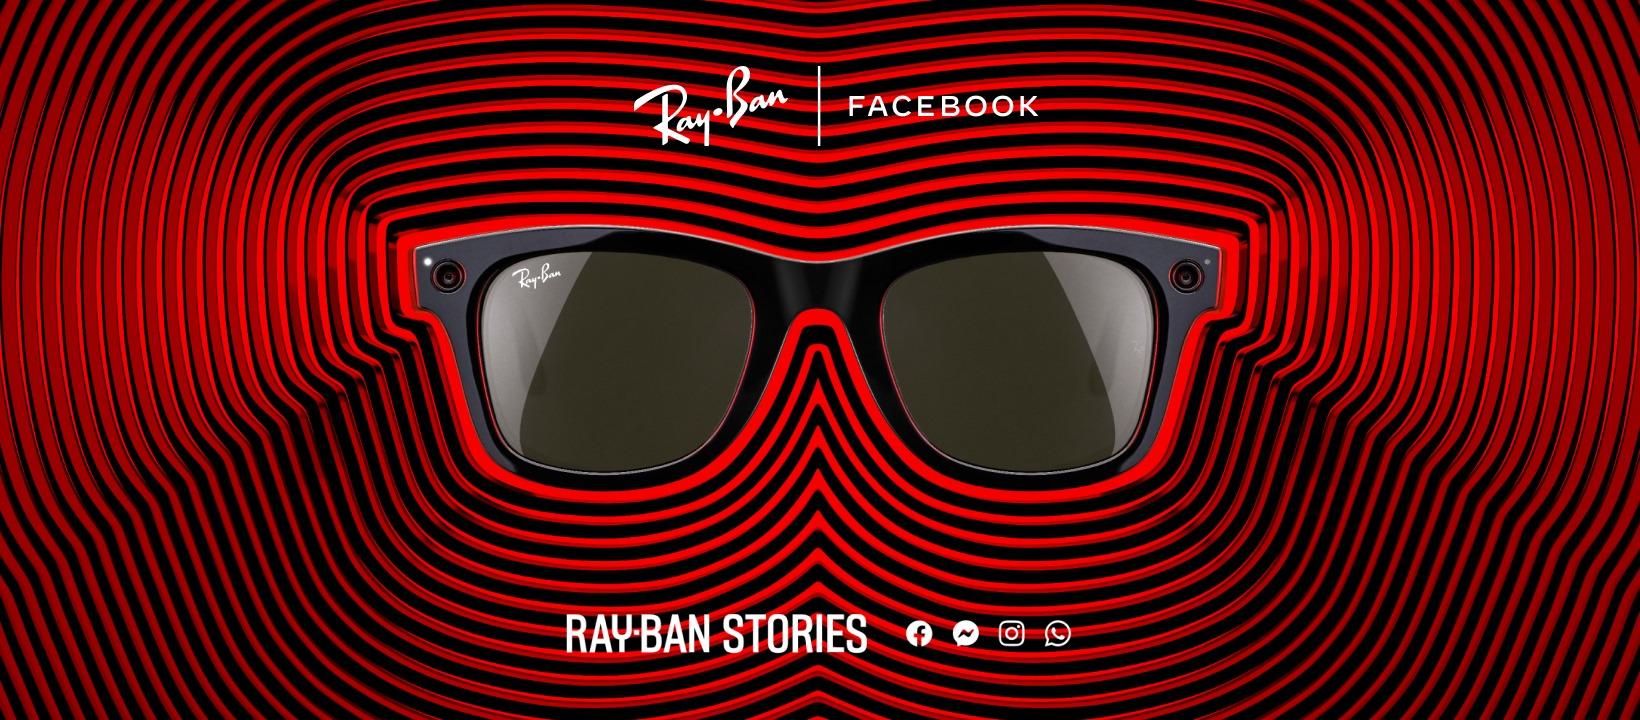 ray-ban facebook stories